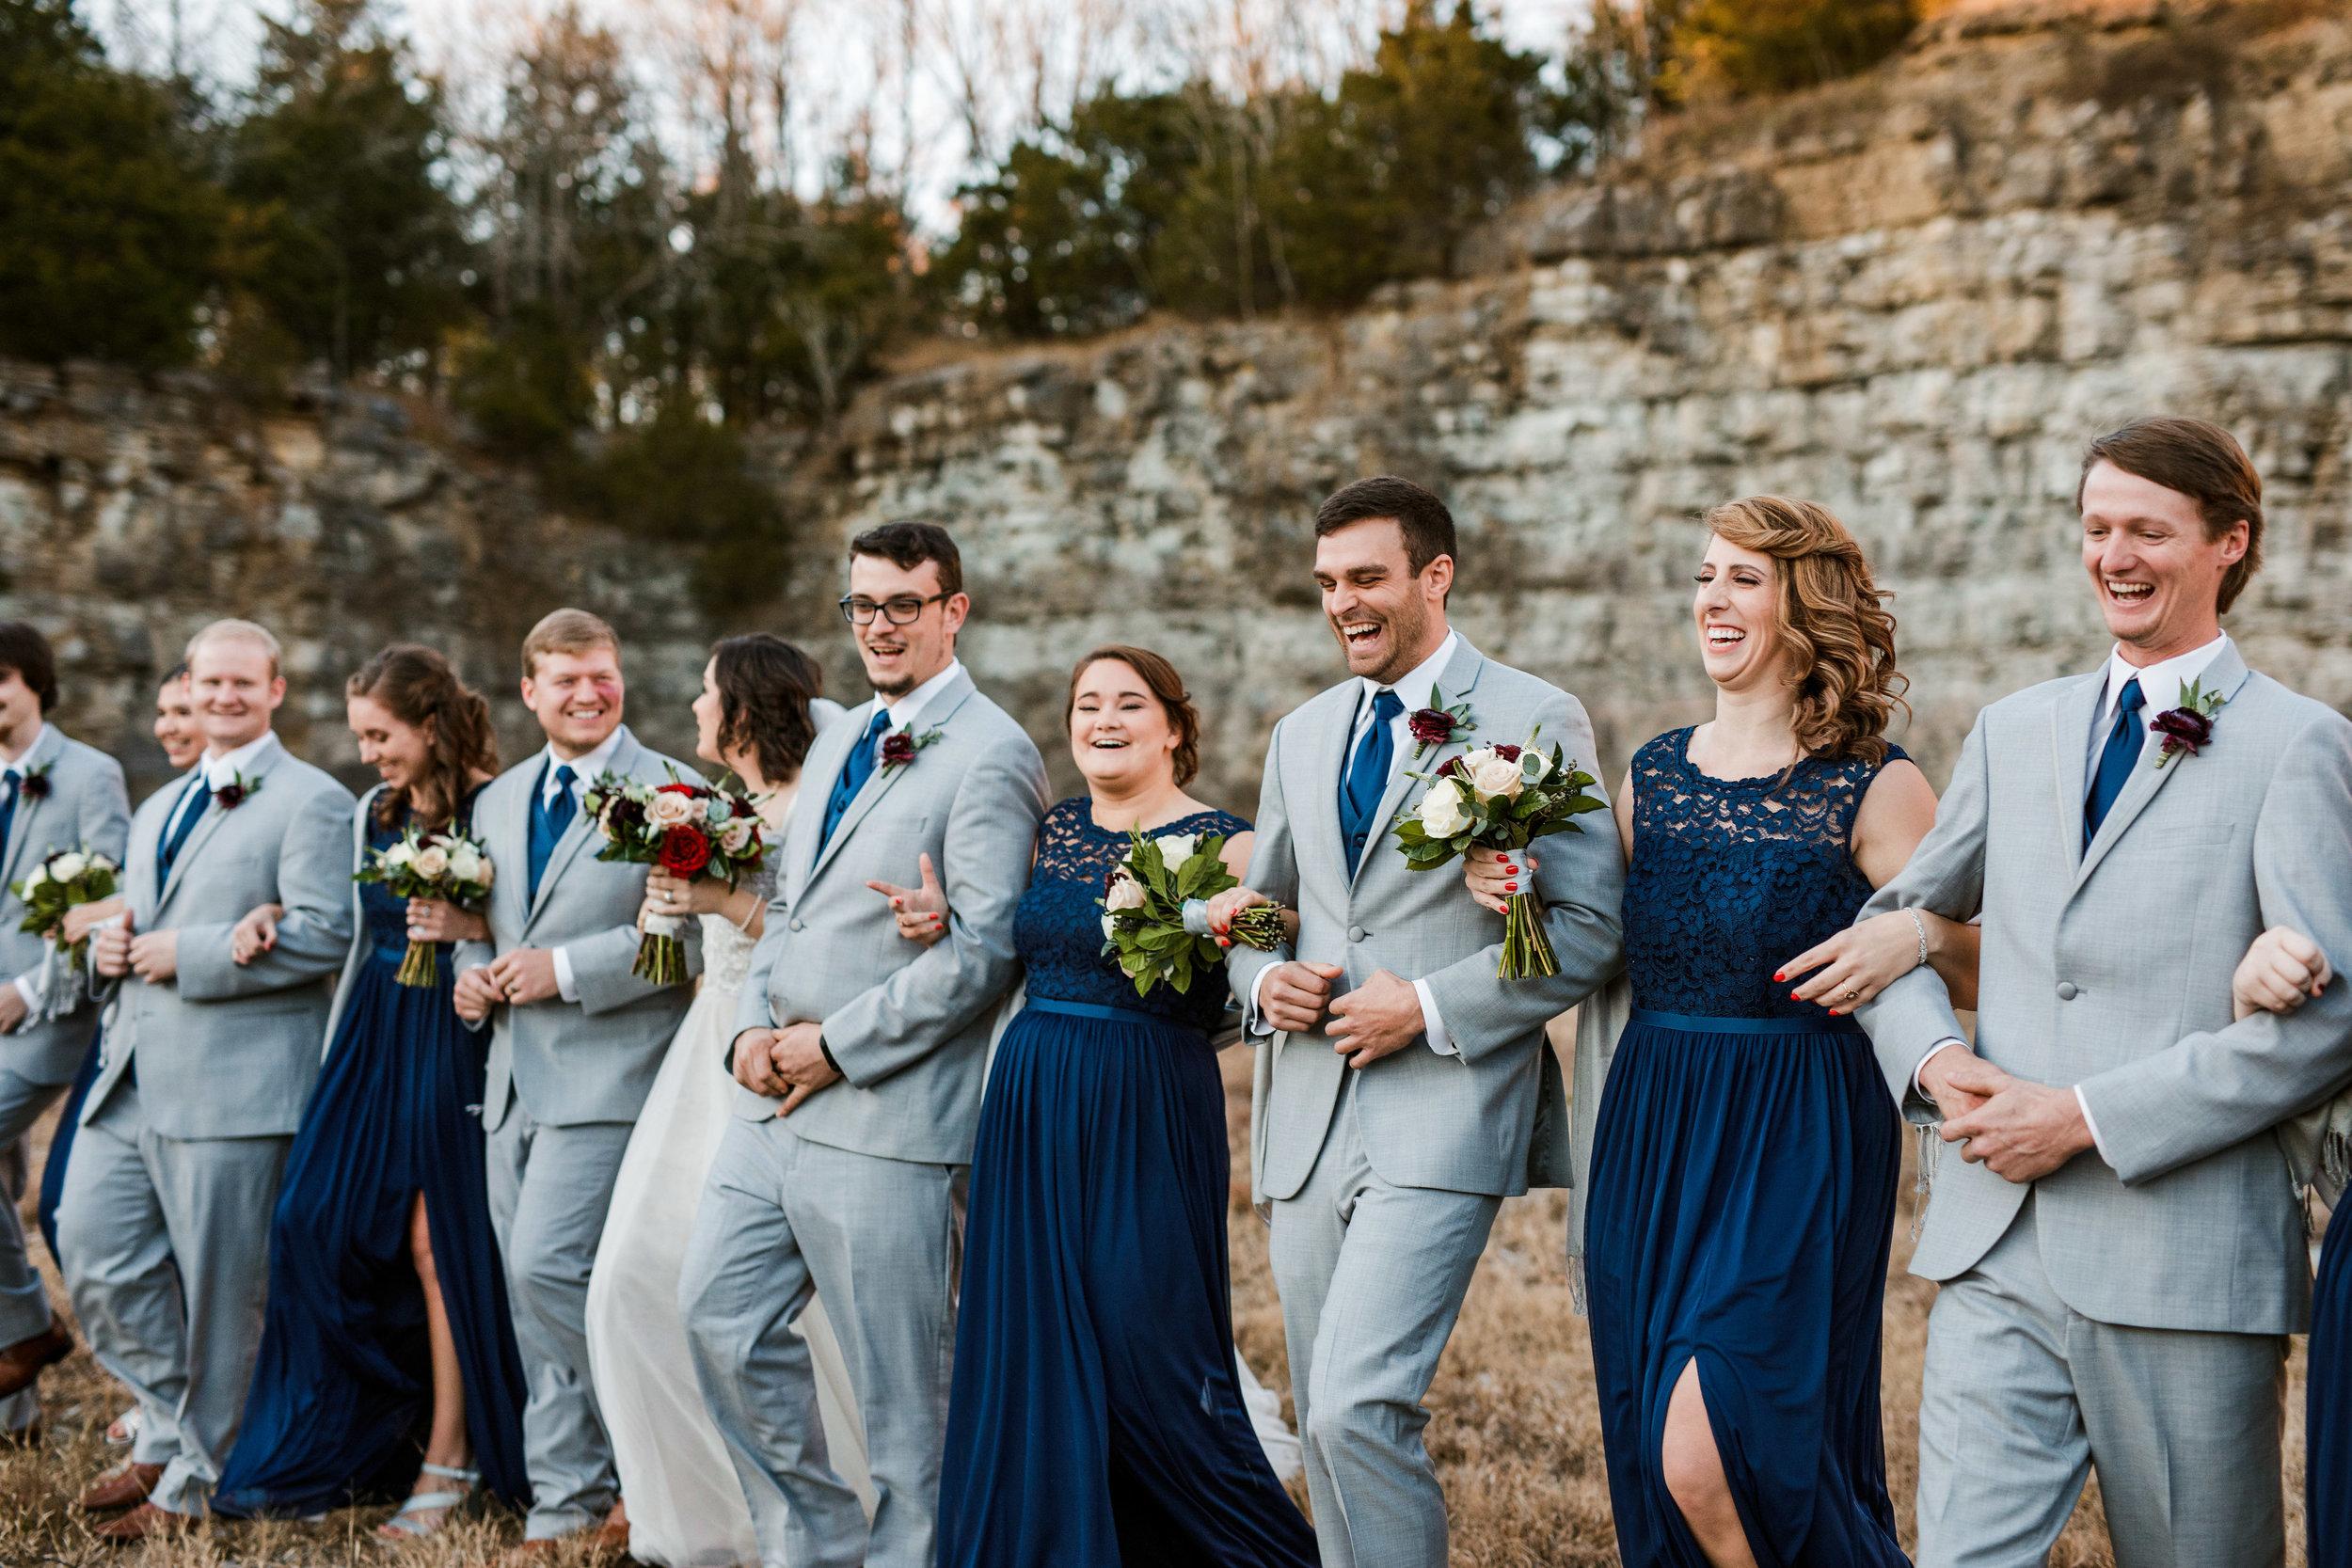 Graystone-Quarry-Wedding 58.jpg